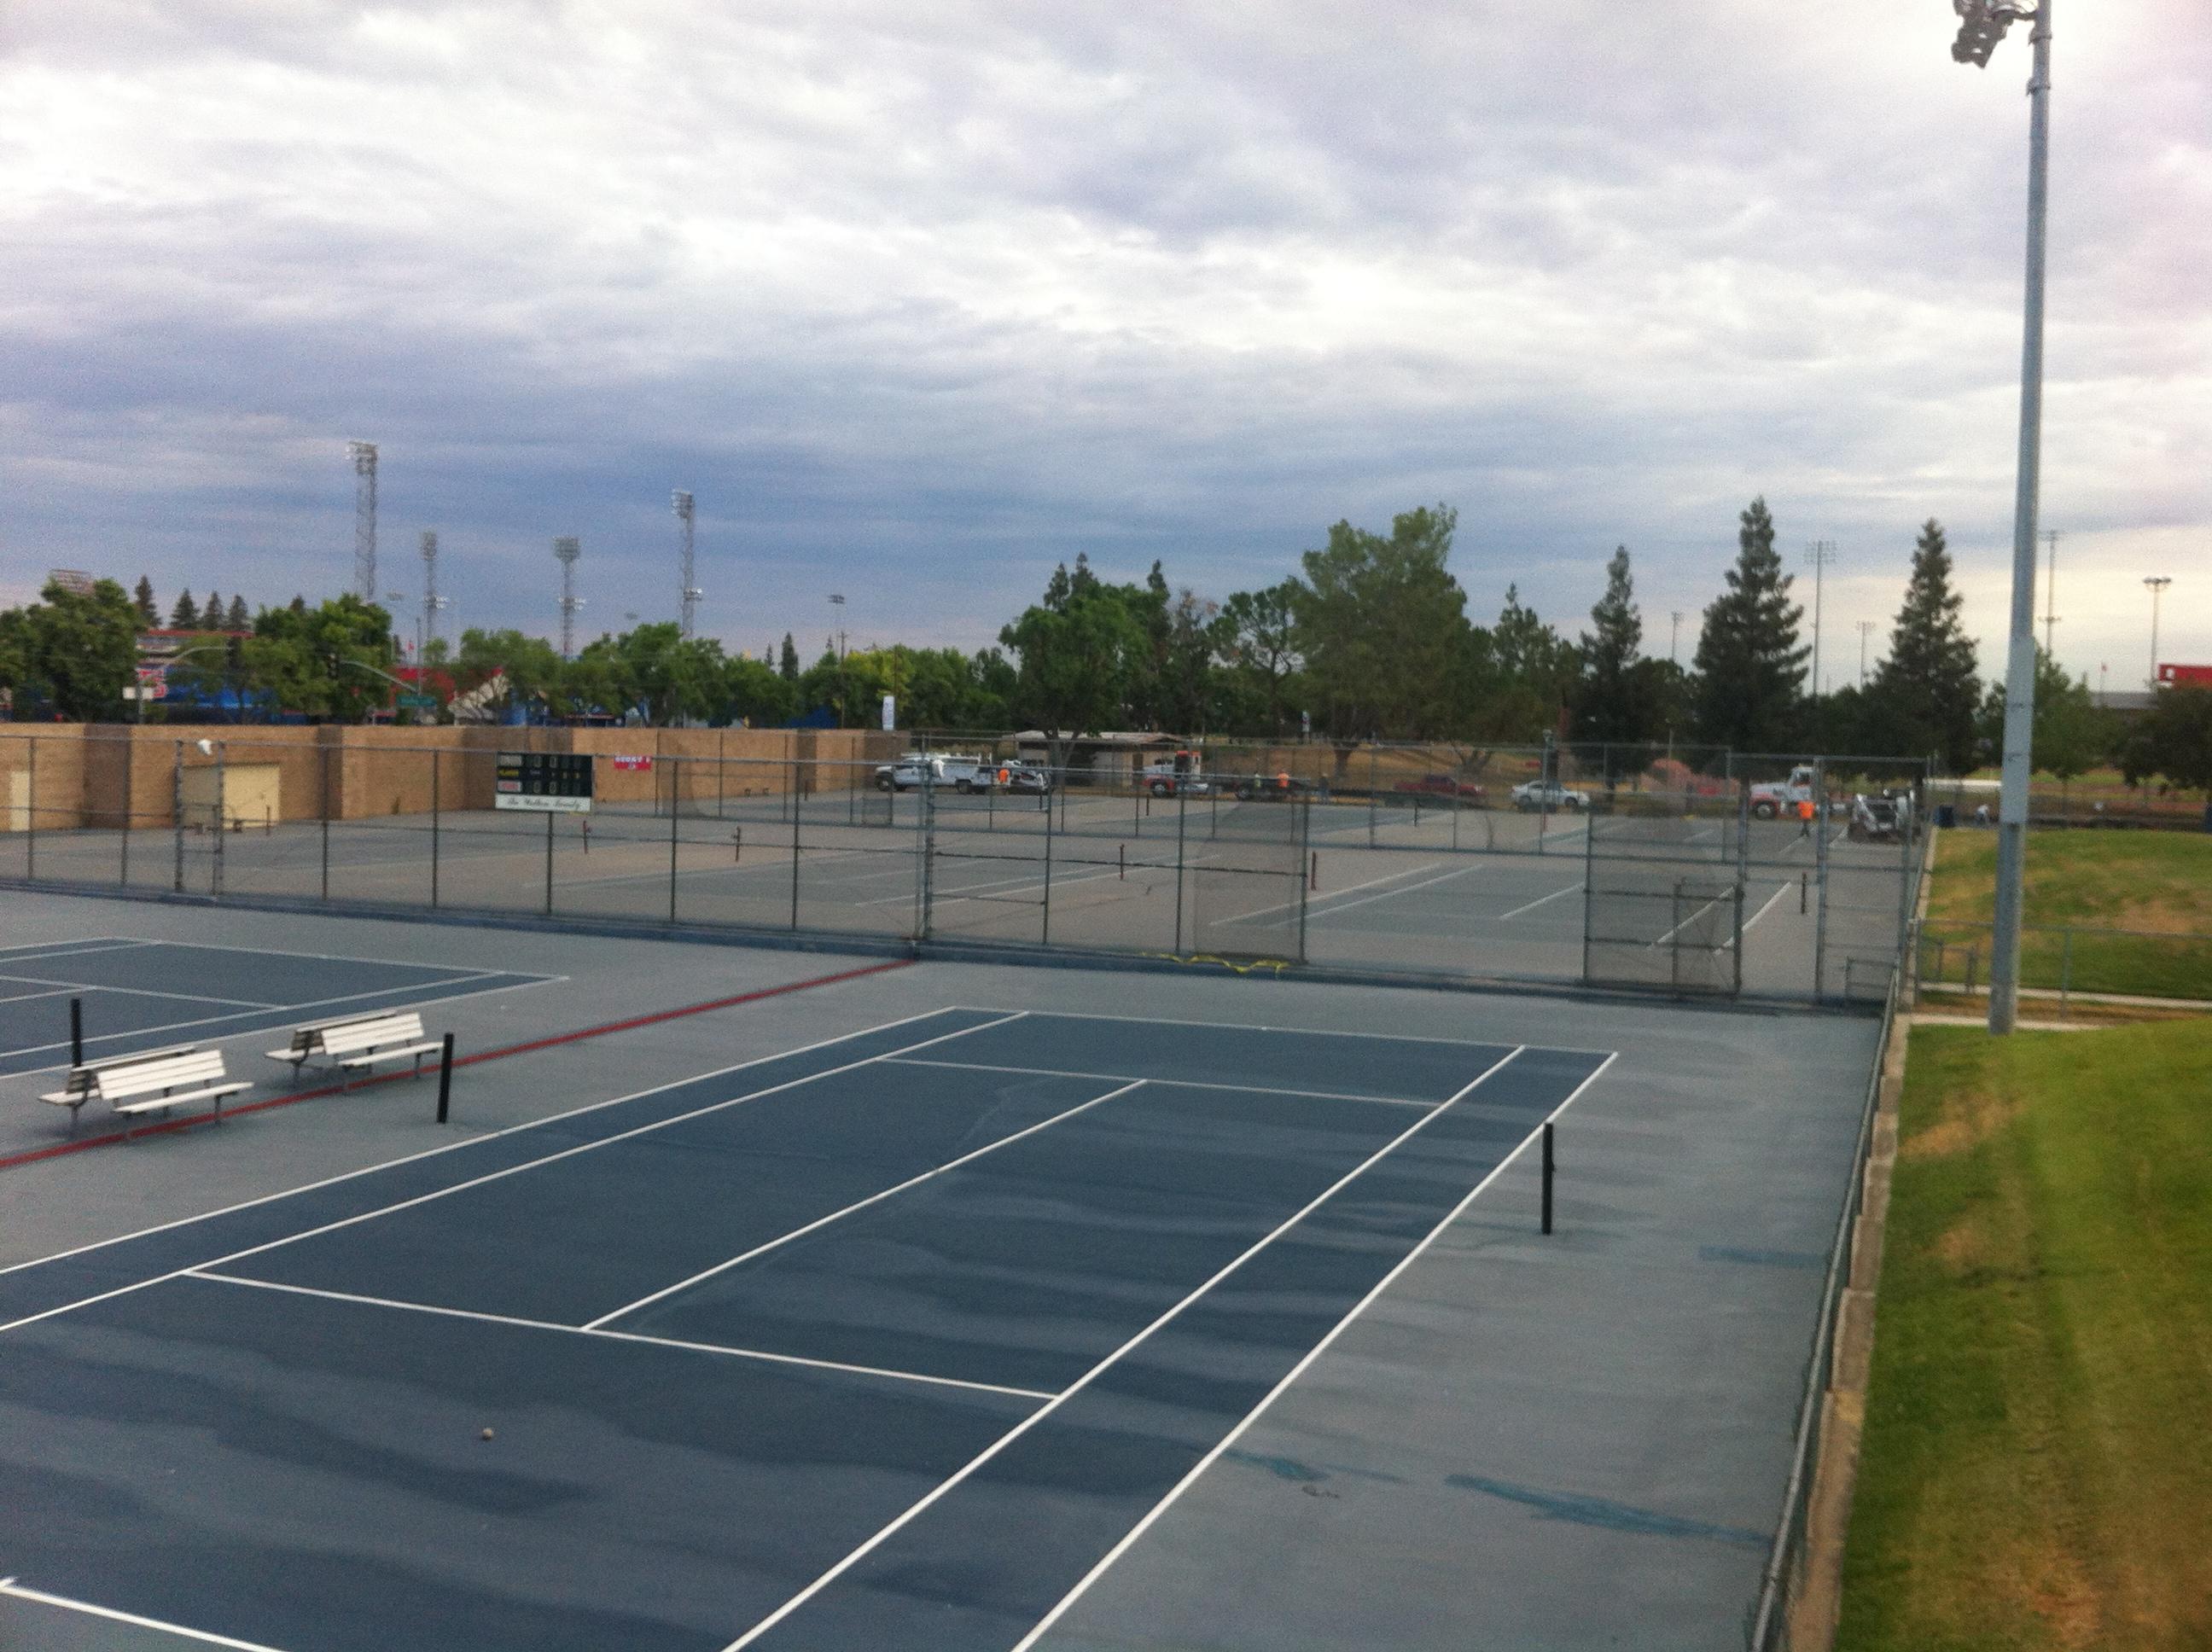 Fresno State Tennis Courts 1.jpg